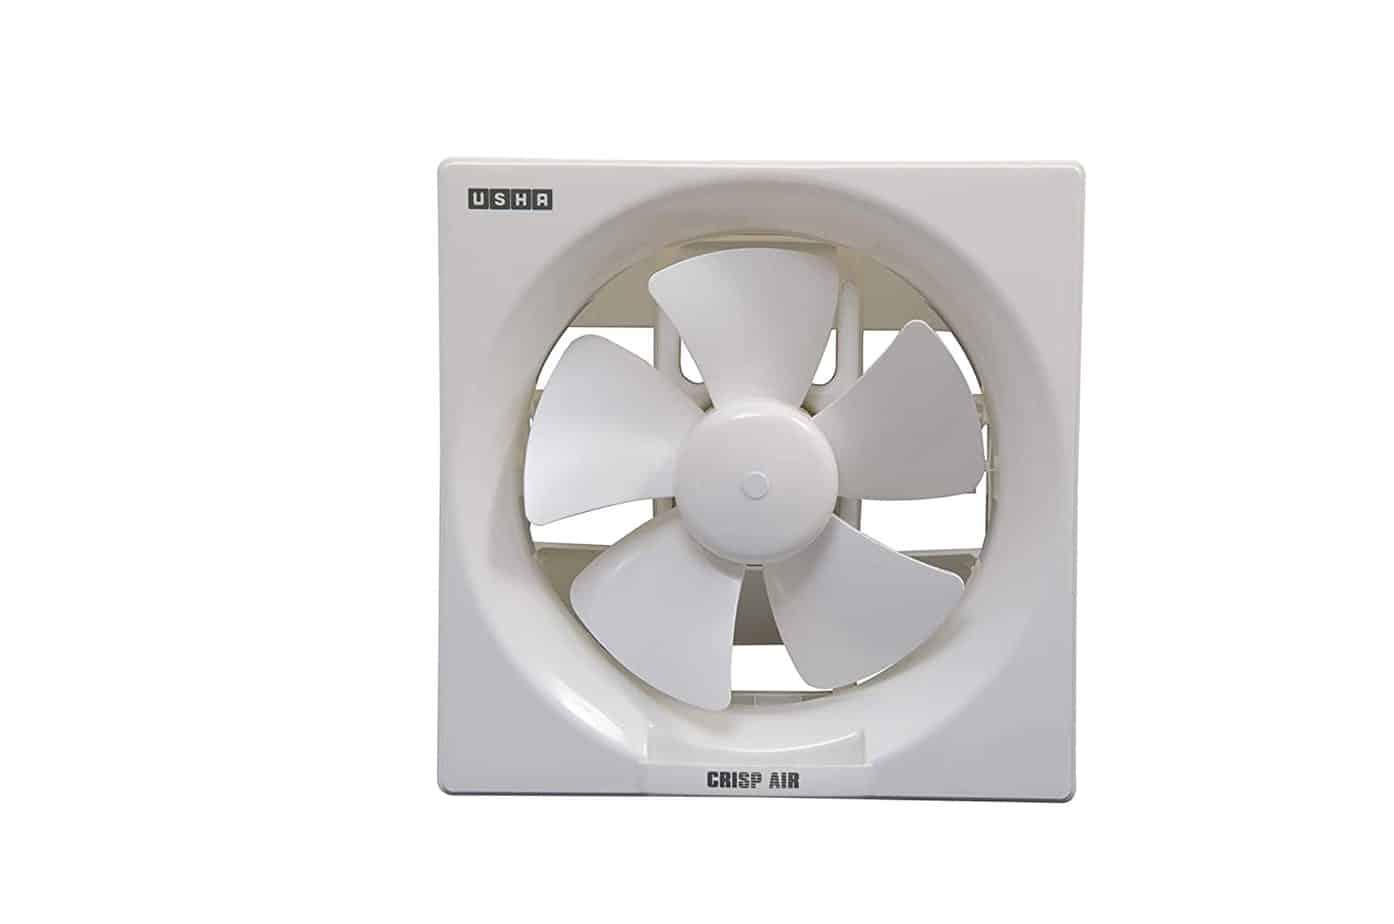 Usha Crisp Air 250 mm Exhaust Fan